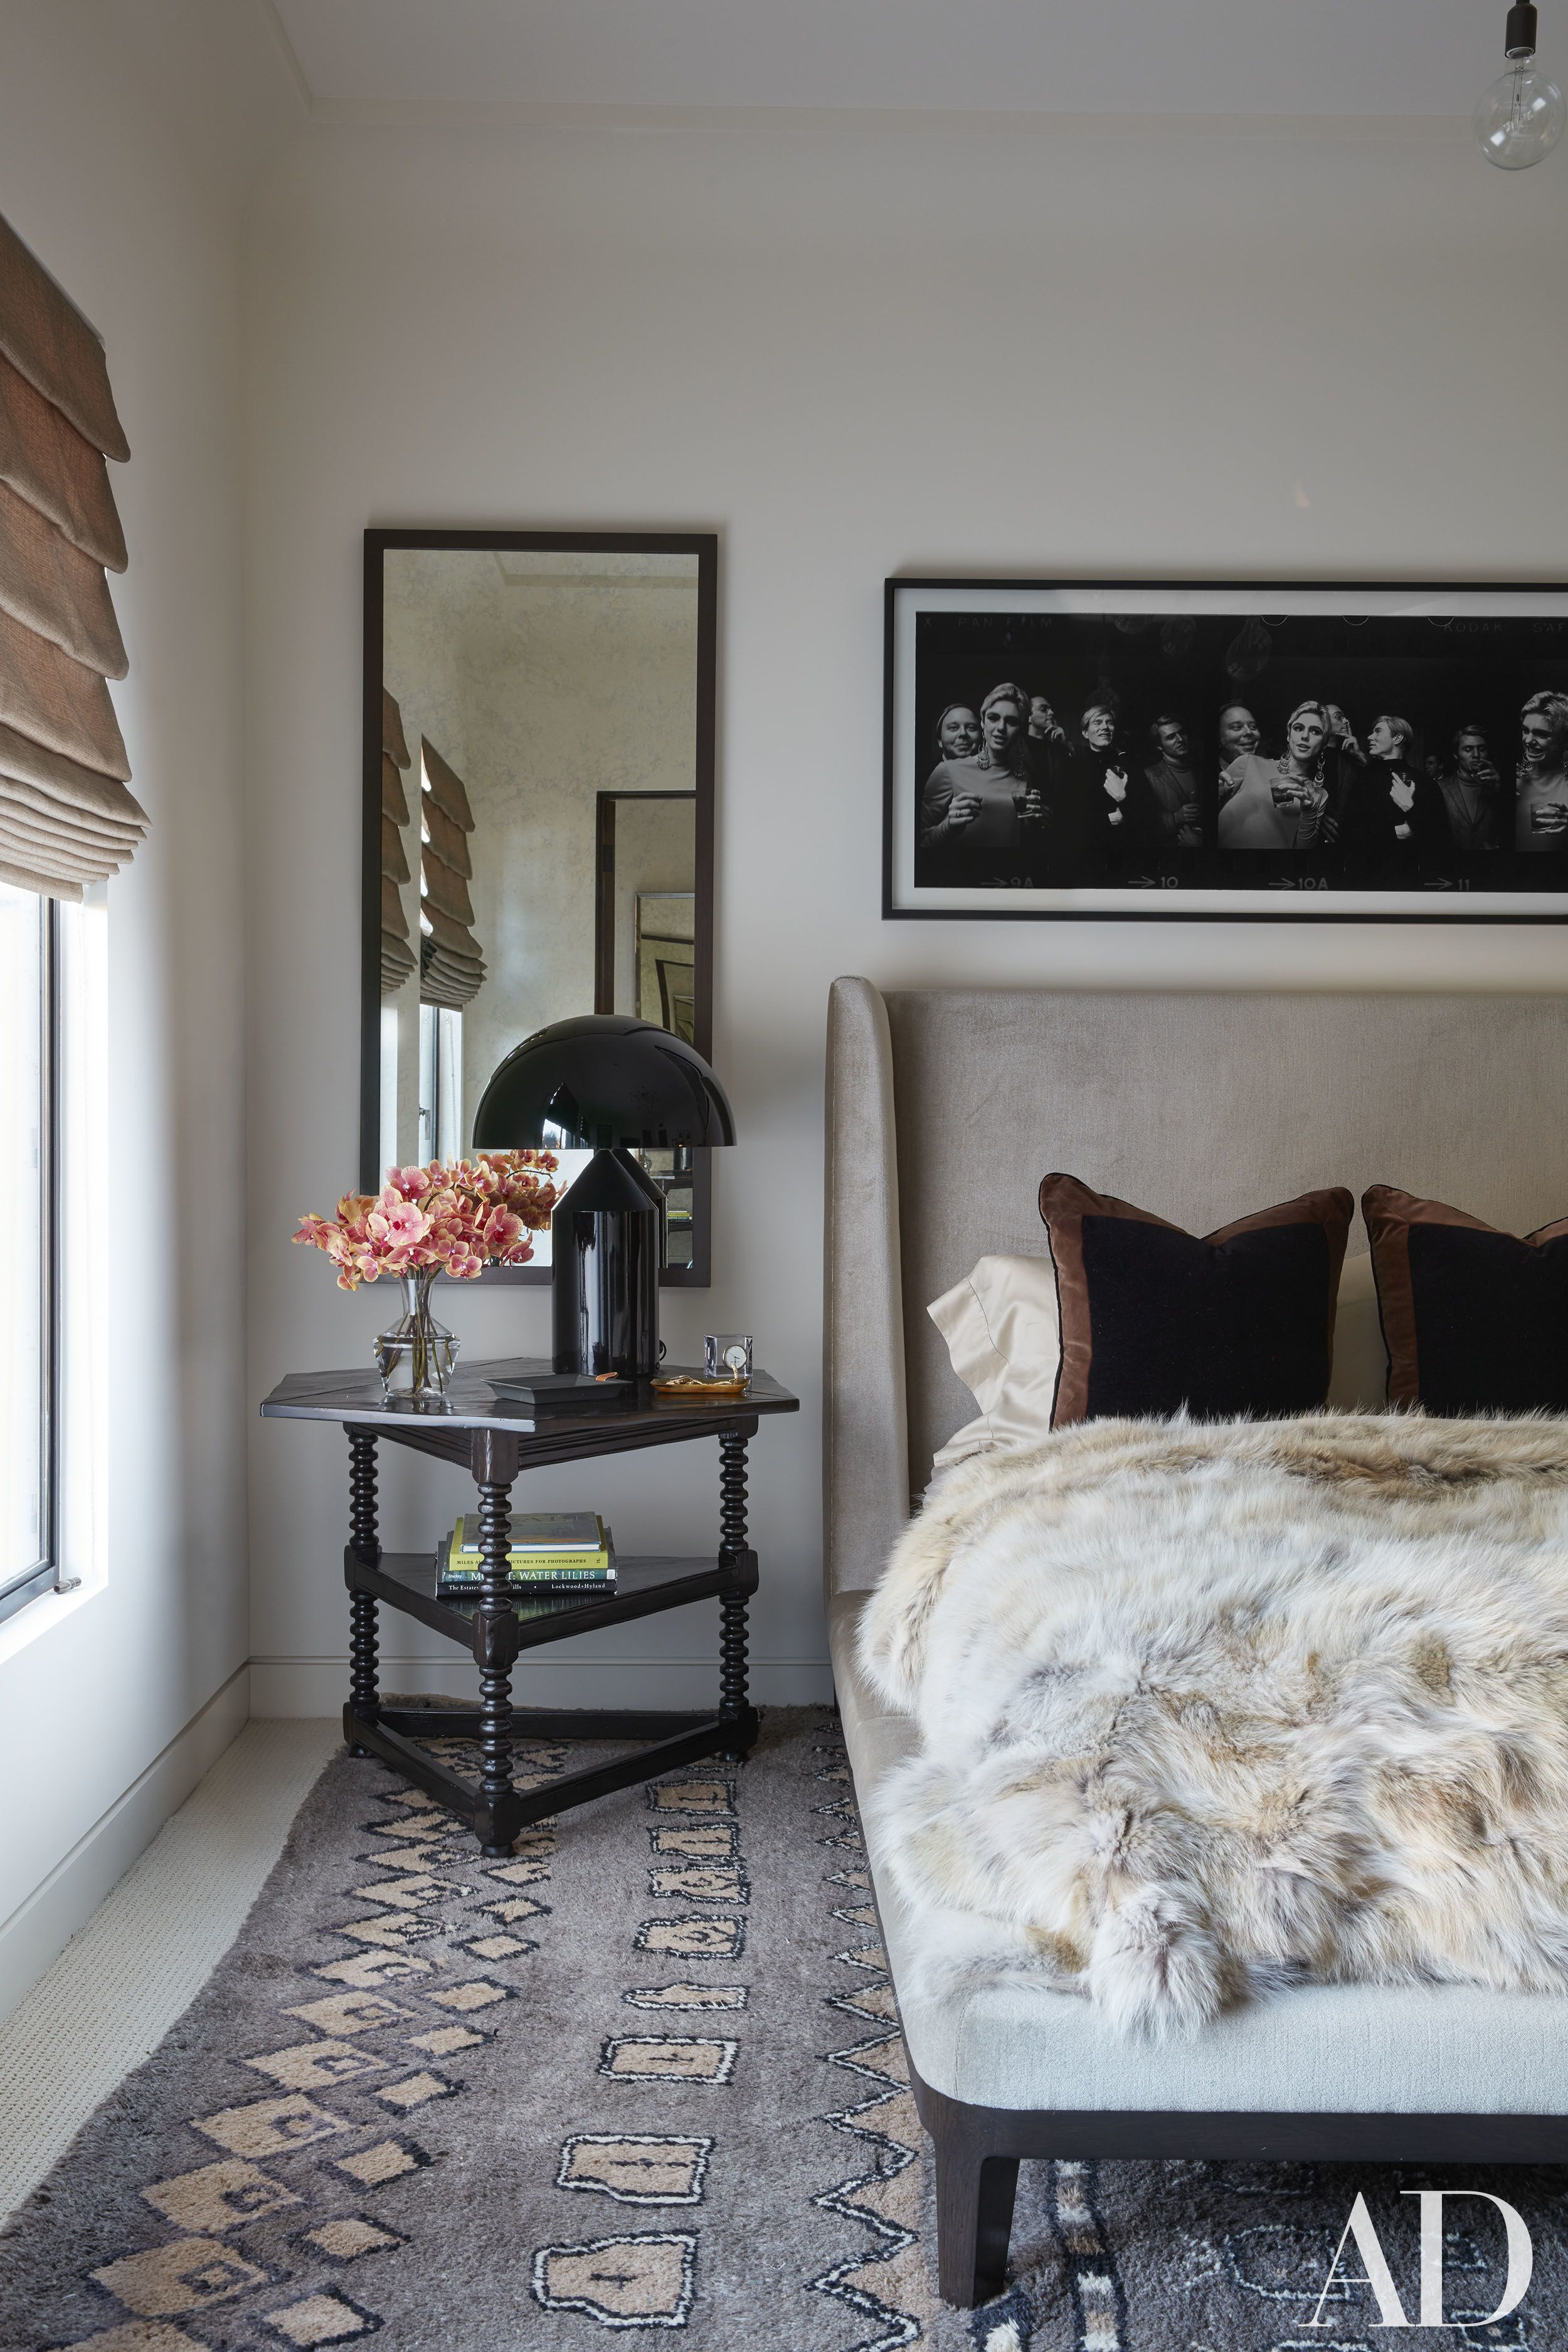 Pin On At Home With Kourtney And Khloe Kardashian Kourtney kardashian bedroom pictures